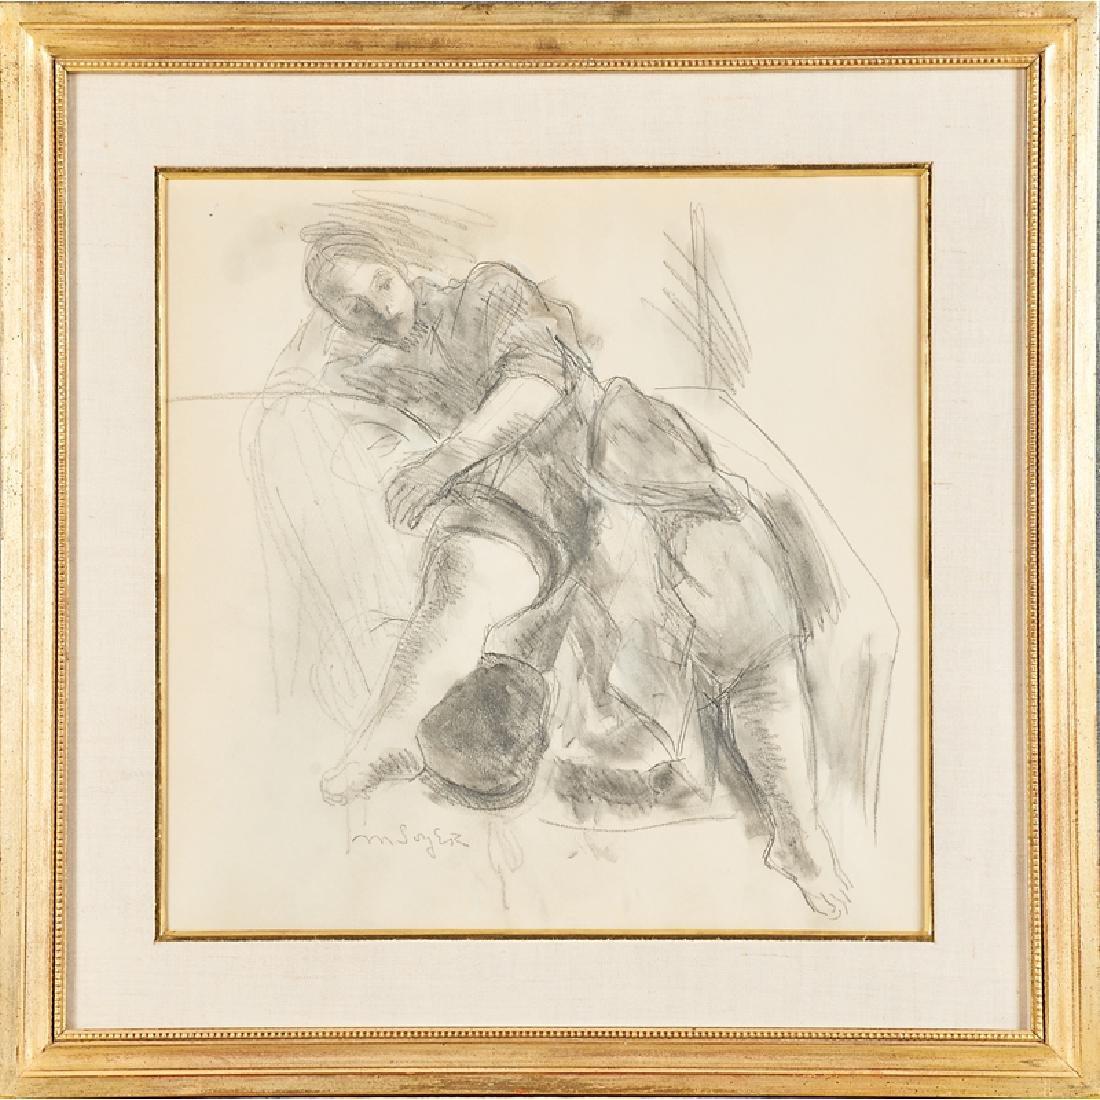 MOSES SOYER (American, 1899-1974); RAPHAEL SOYER (